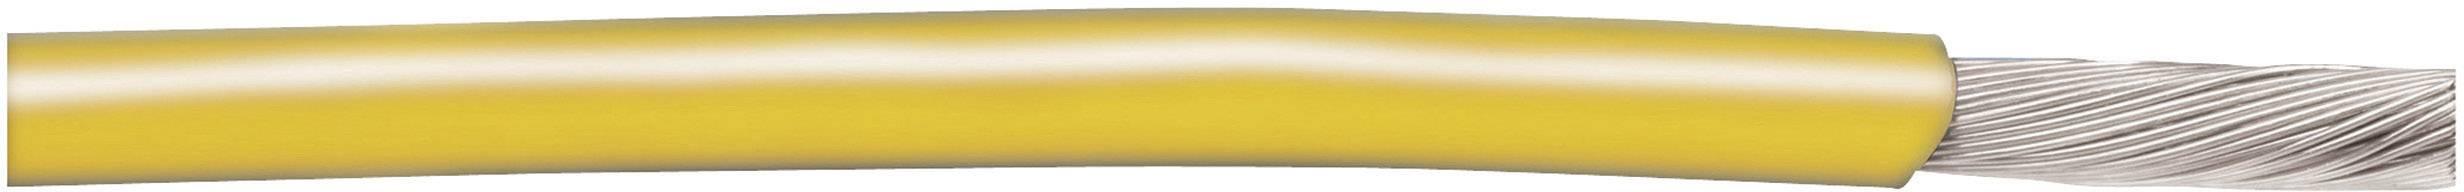 Opletenie / lanko AlphaWire 3077 WH001 1 x 1.31 mm², vonkajší Ø 2.33 mm, metrový tovar